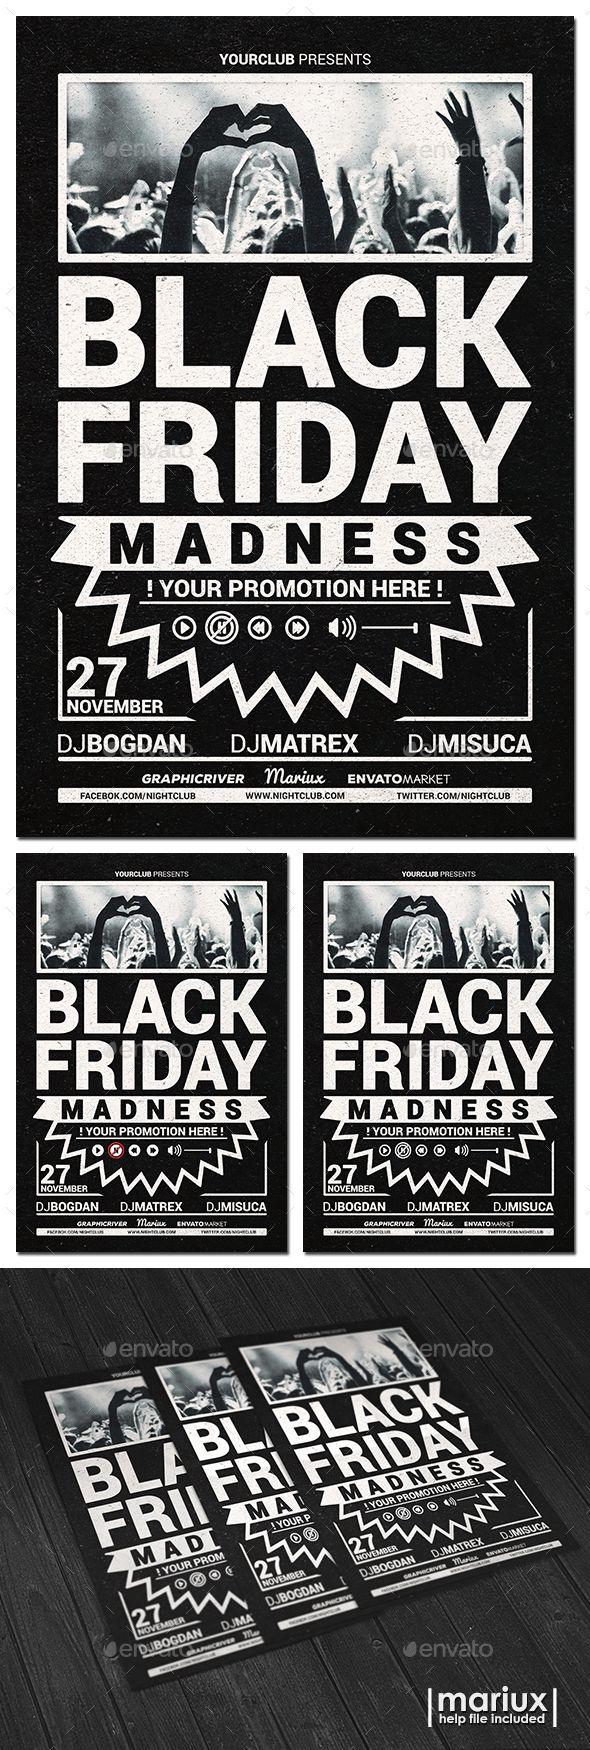 Black Friday Flyer Template PSD #design Download: http://graphicriver.net/item/black-friday-flyer/13403962?ref=ksioks